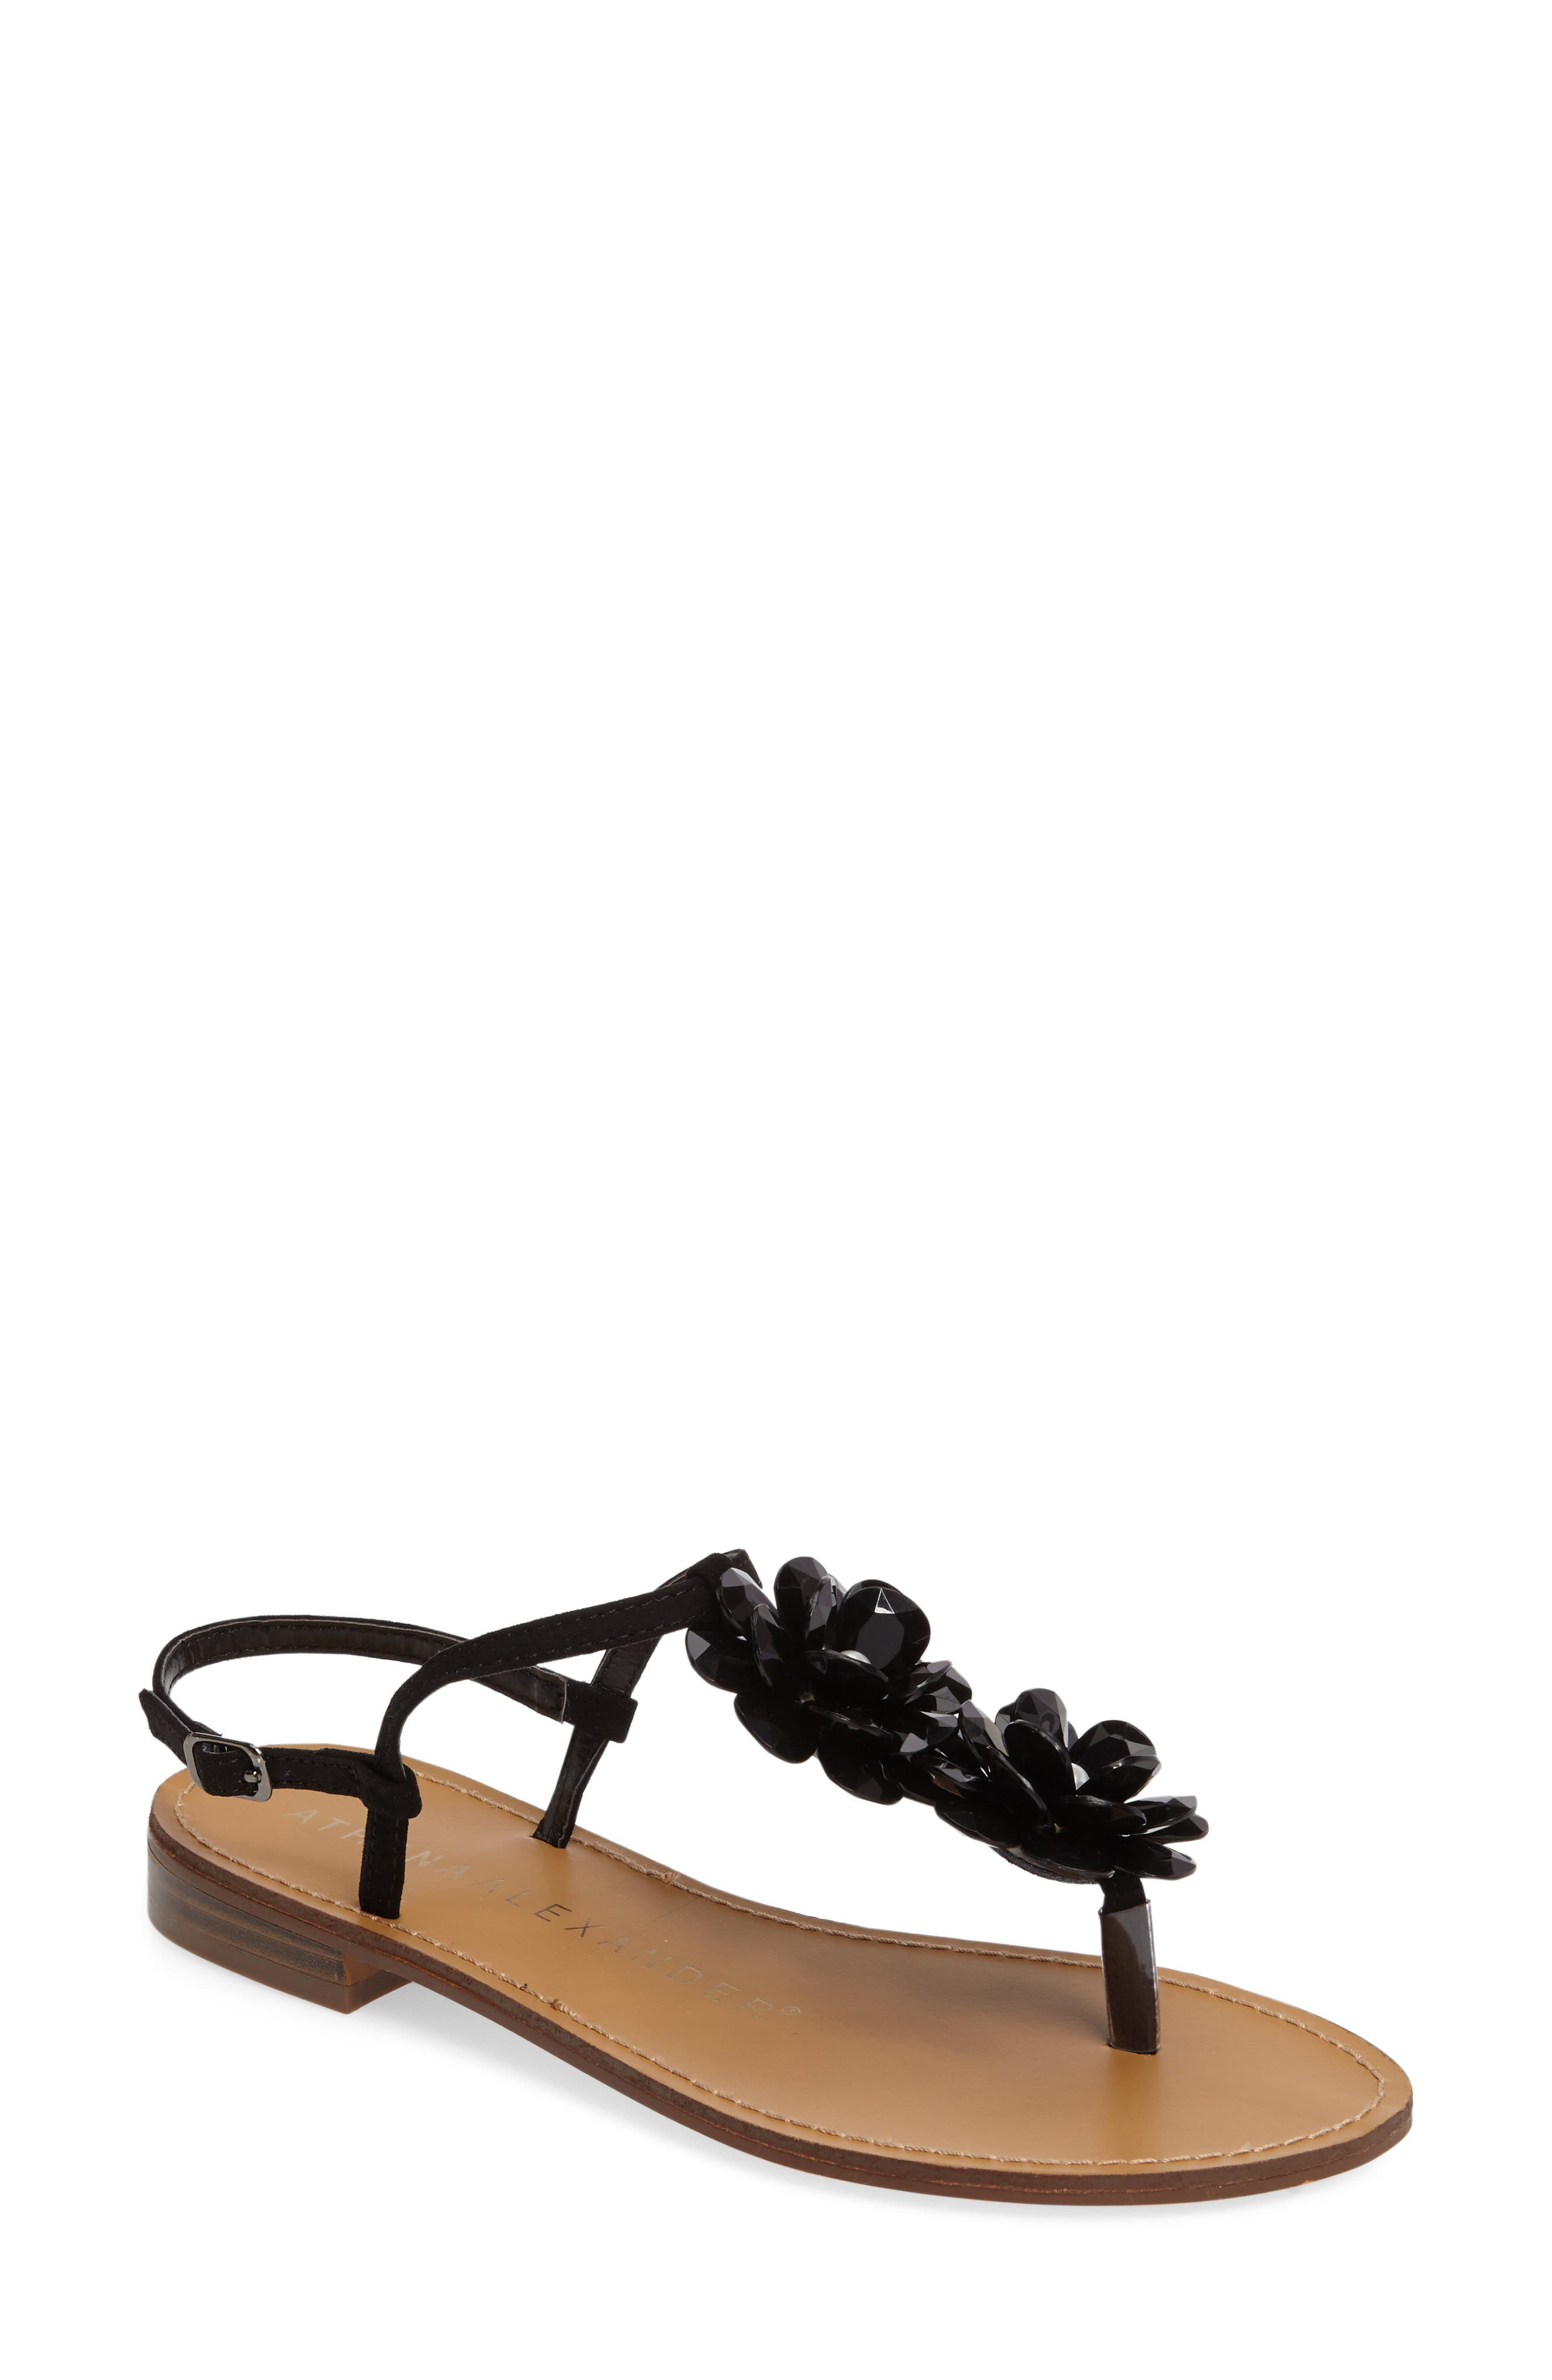 Blossom Sandal,                         Main,                         color,